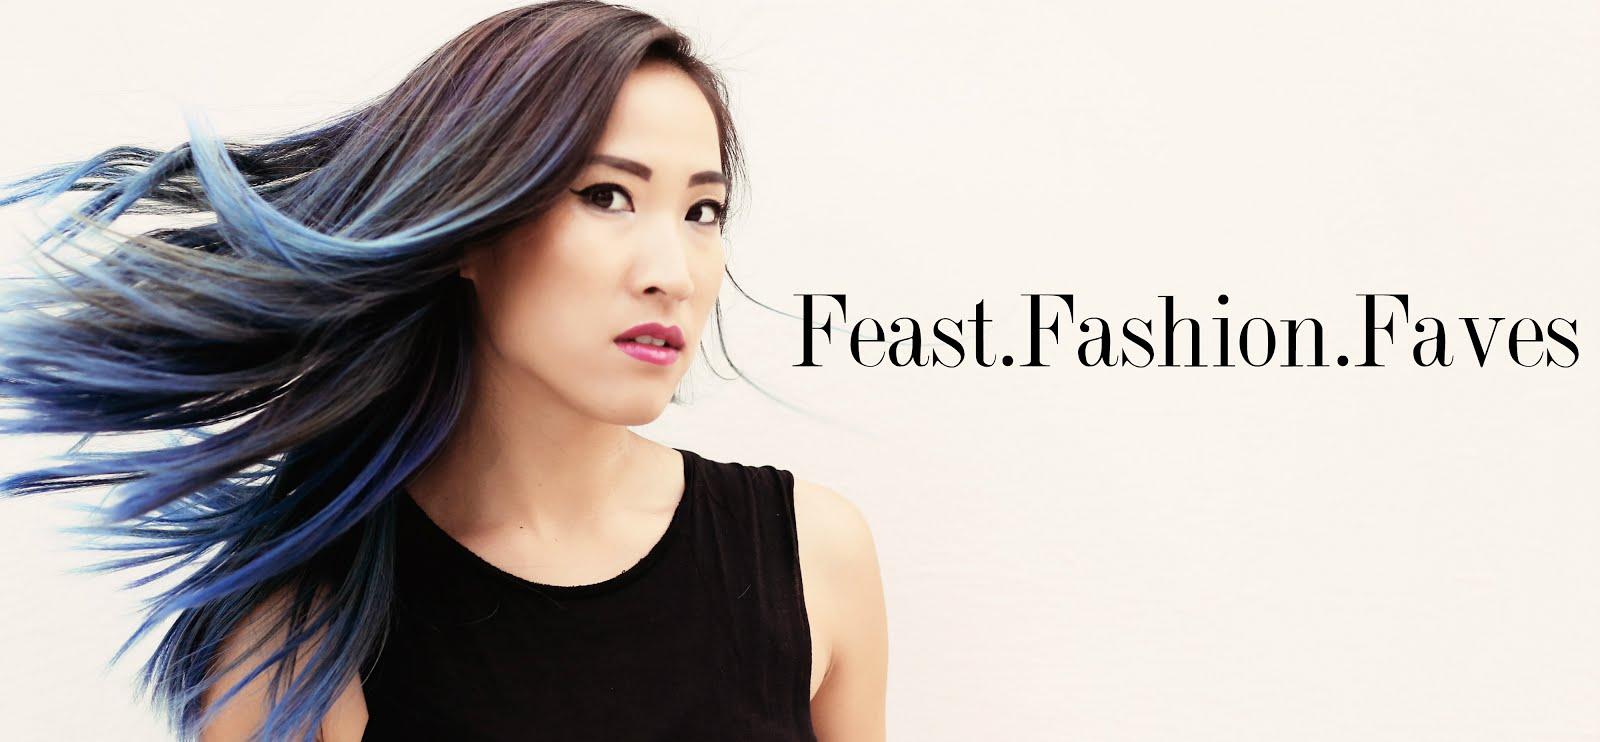 Feast Fashion Faves